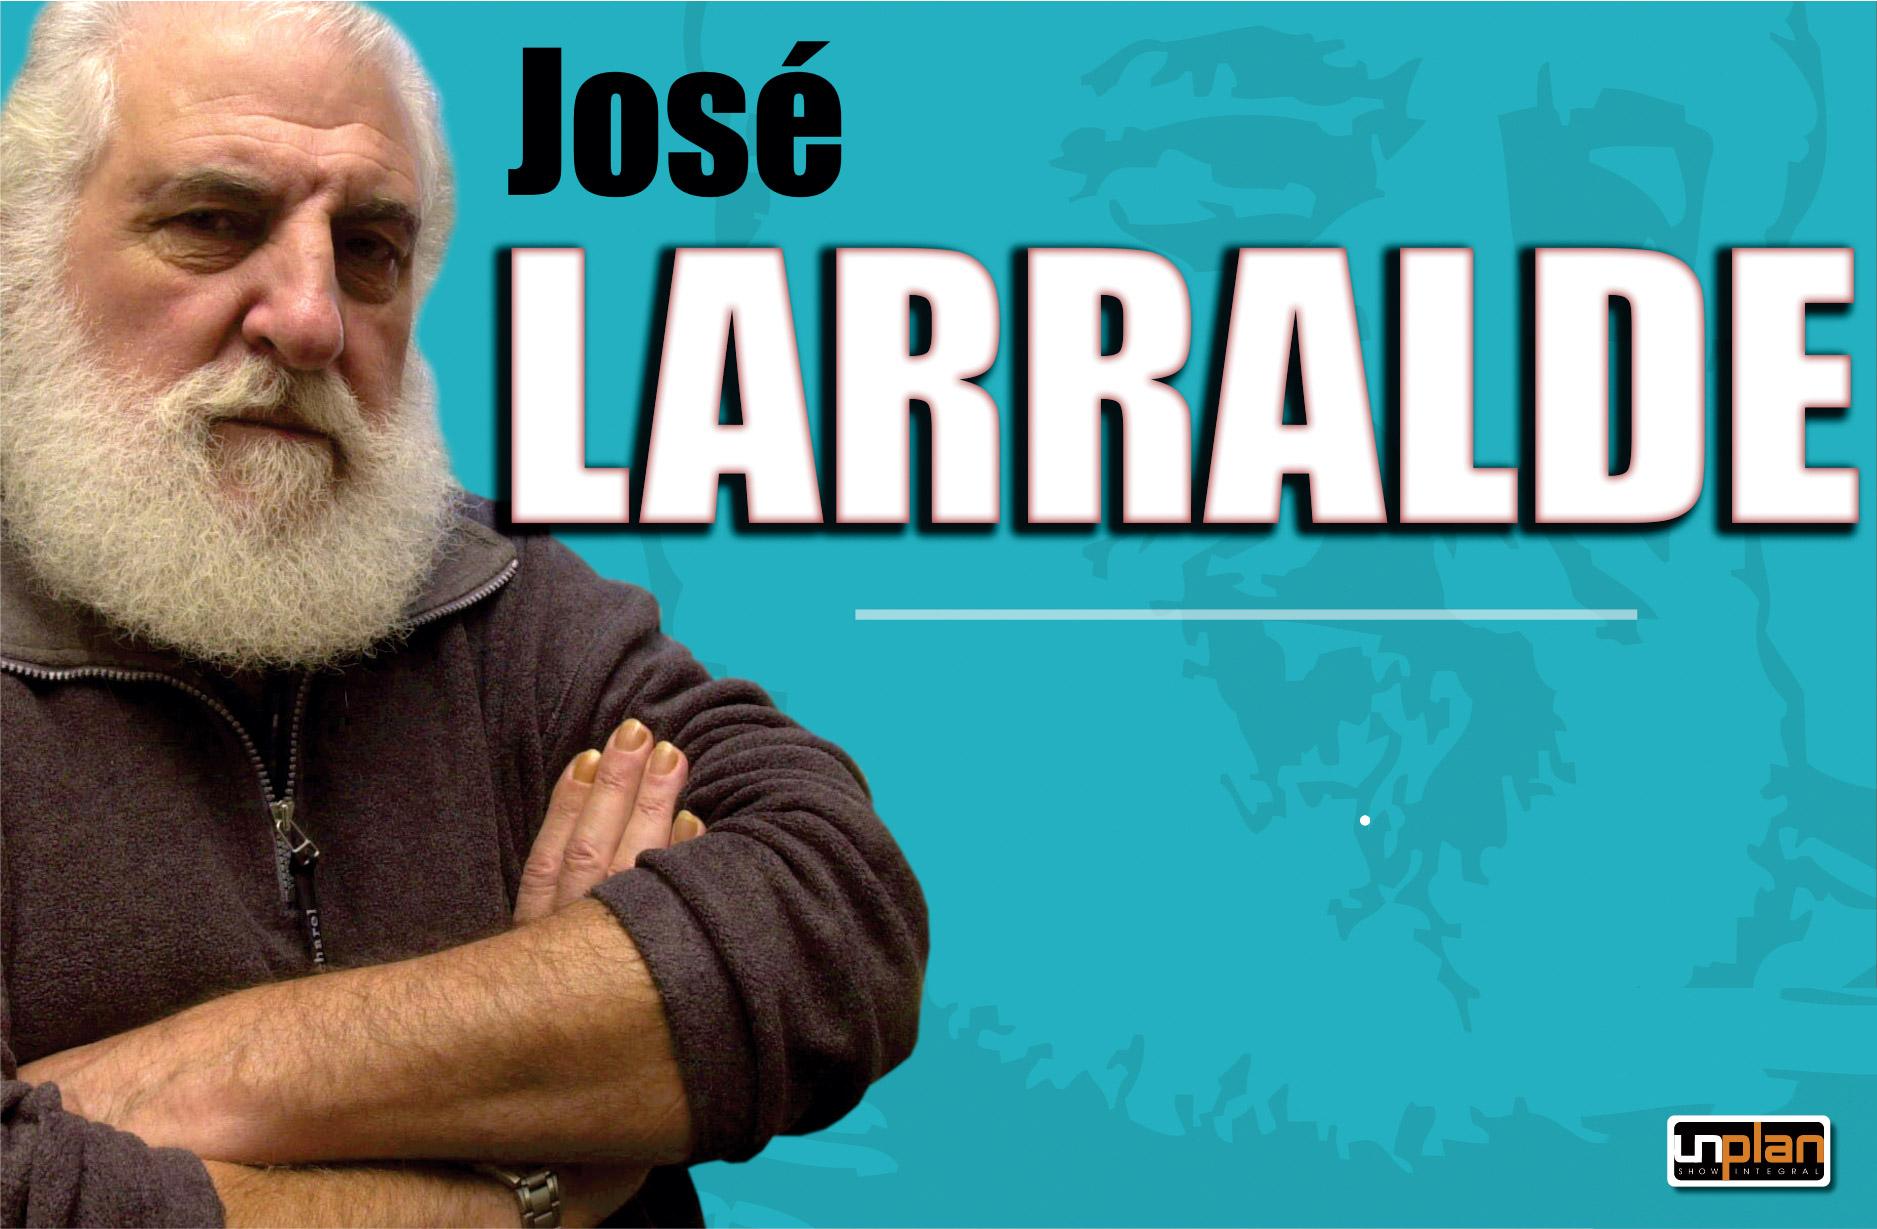 JOSE-LARRALDE-GIRA-NACIONAL-2010